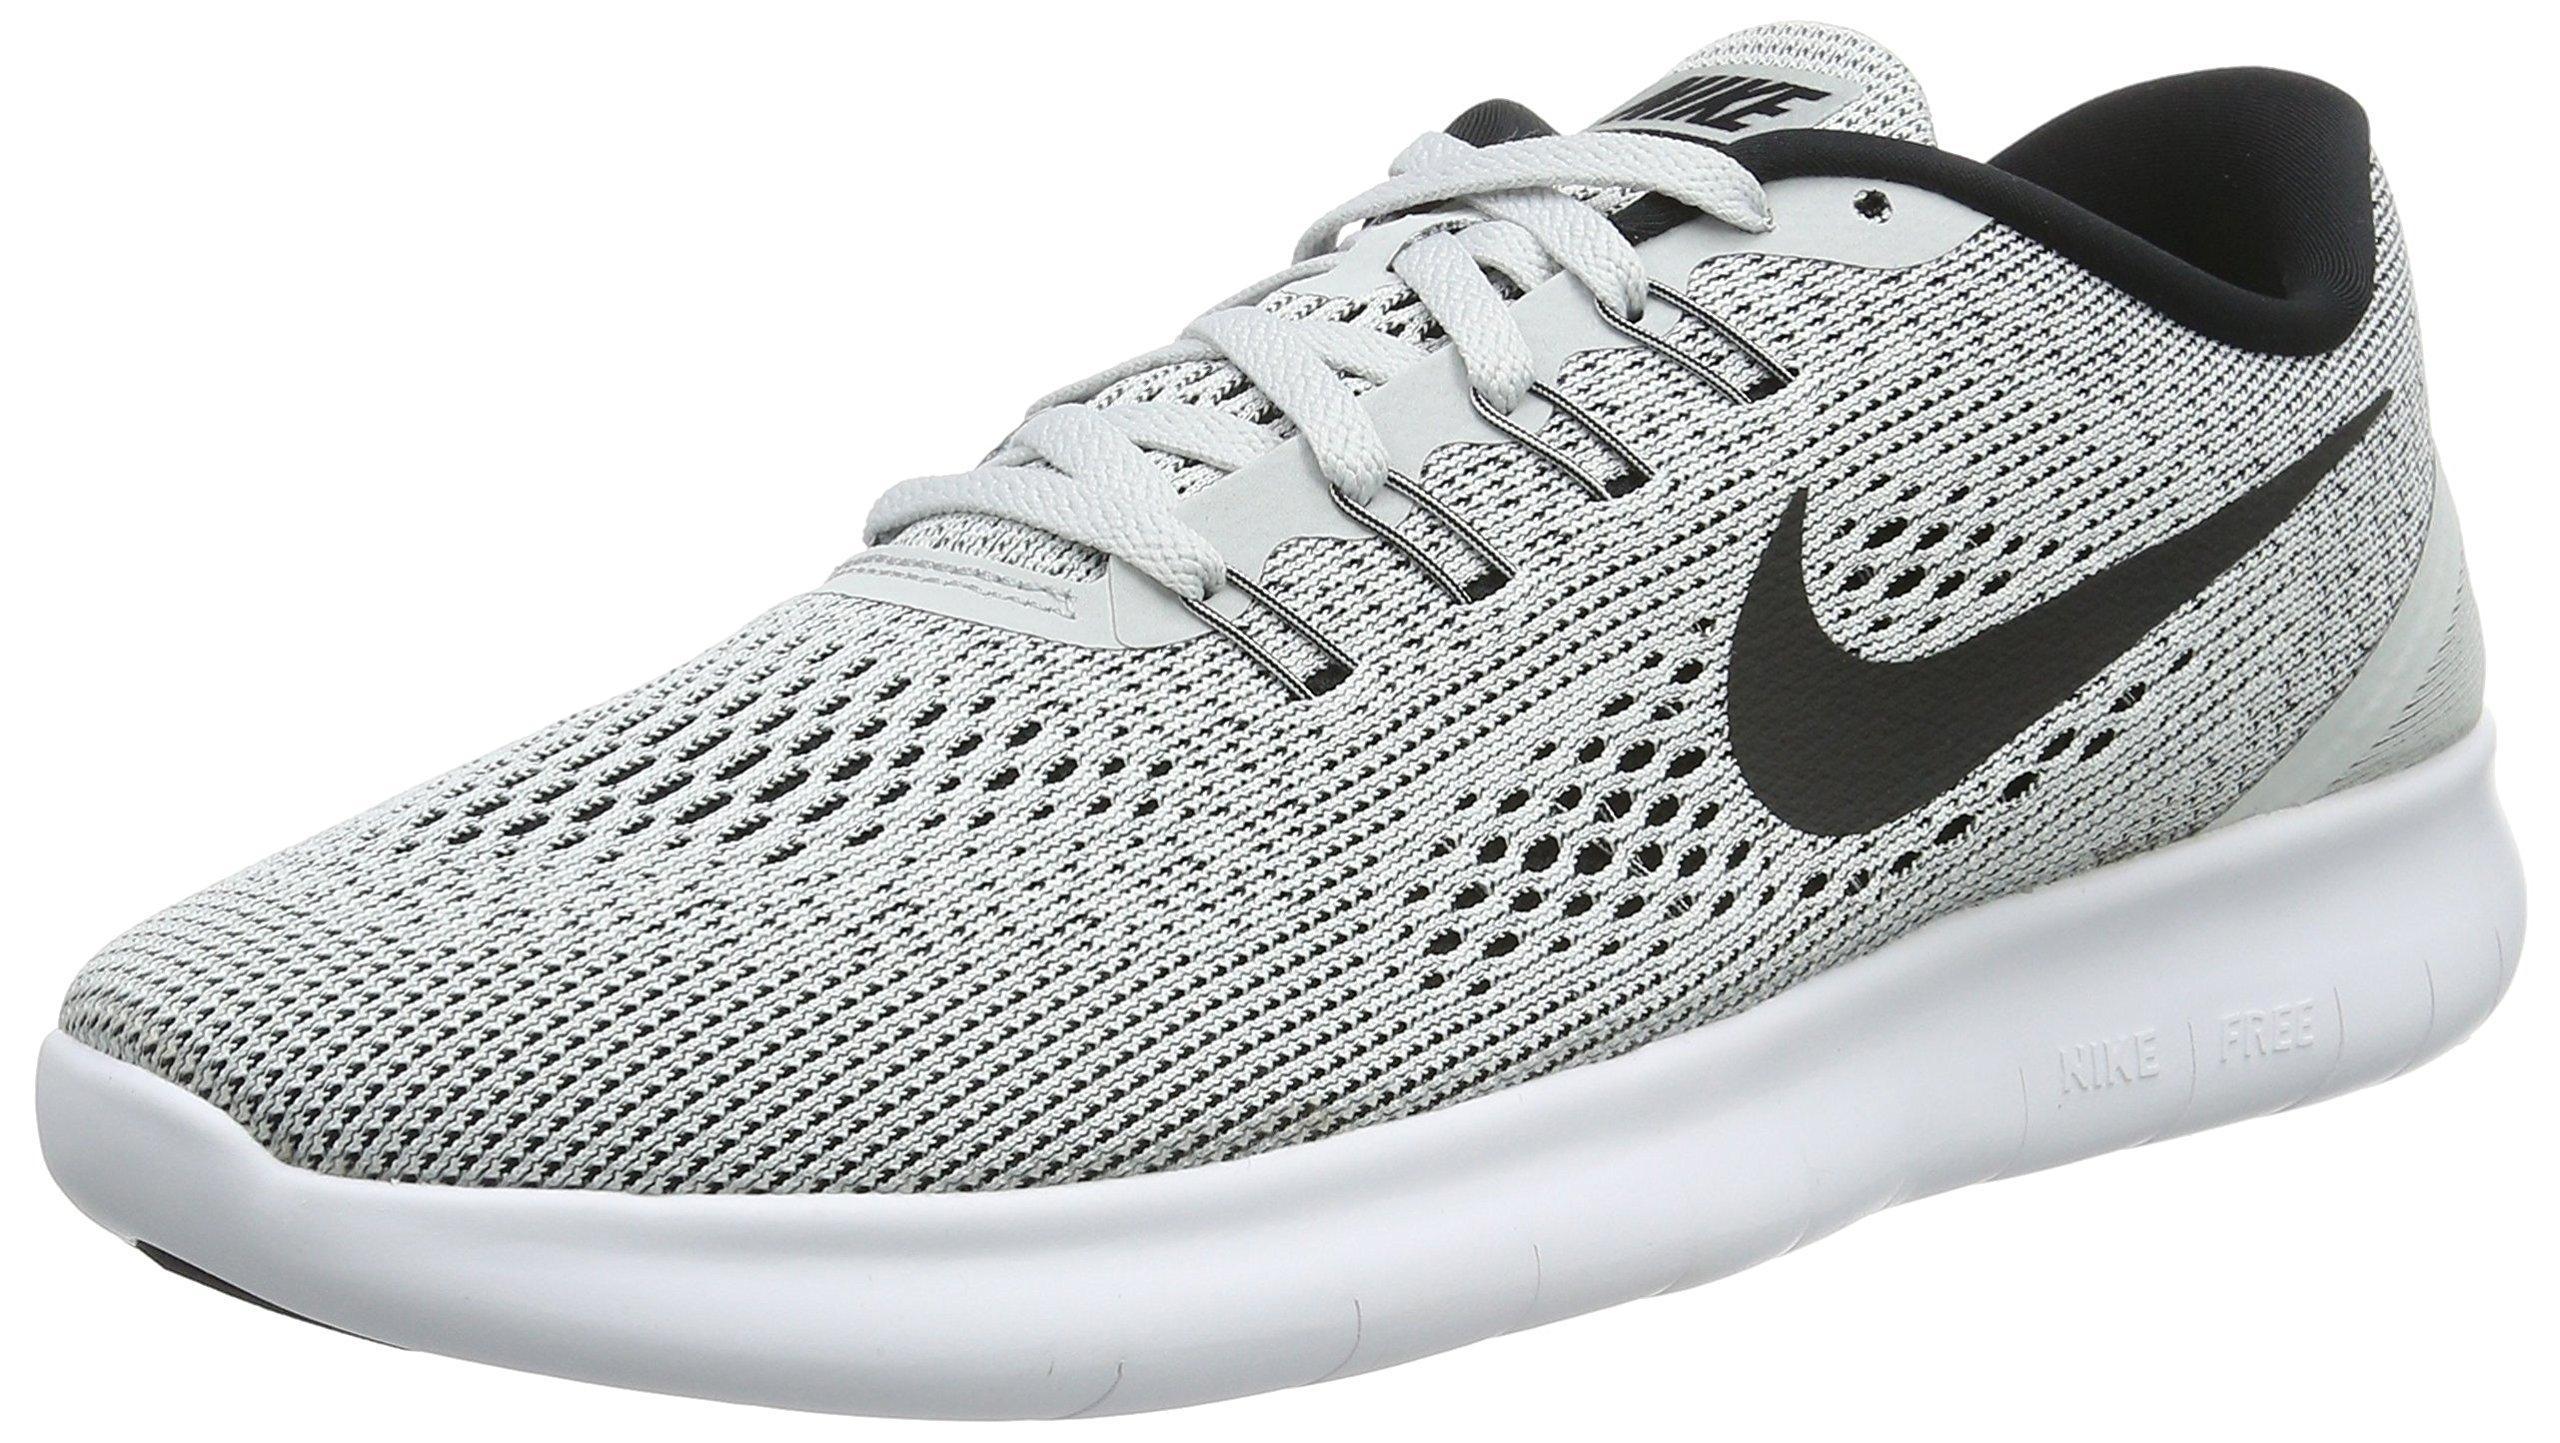 Nike Men's Free RN Running Shoe White/Pure Platinum/Black Size 7.5 M US by Nike (Image #1)